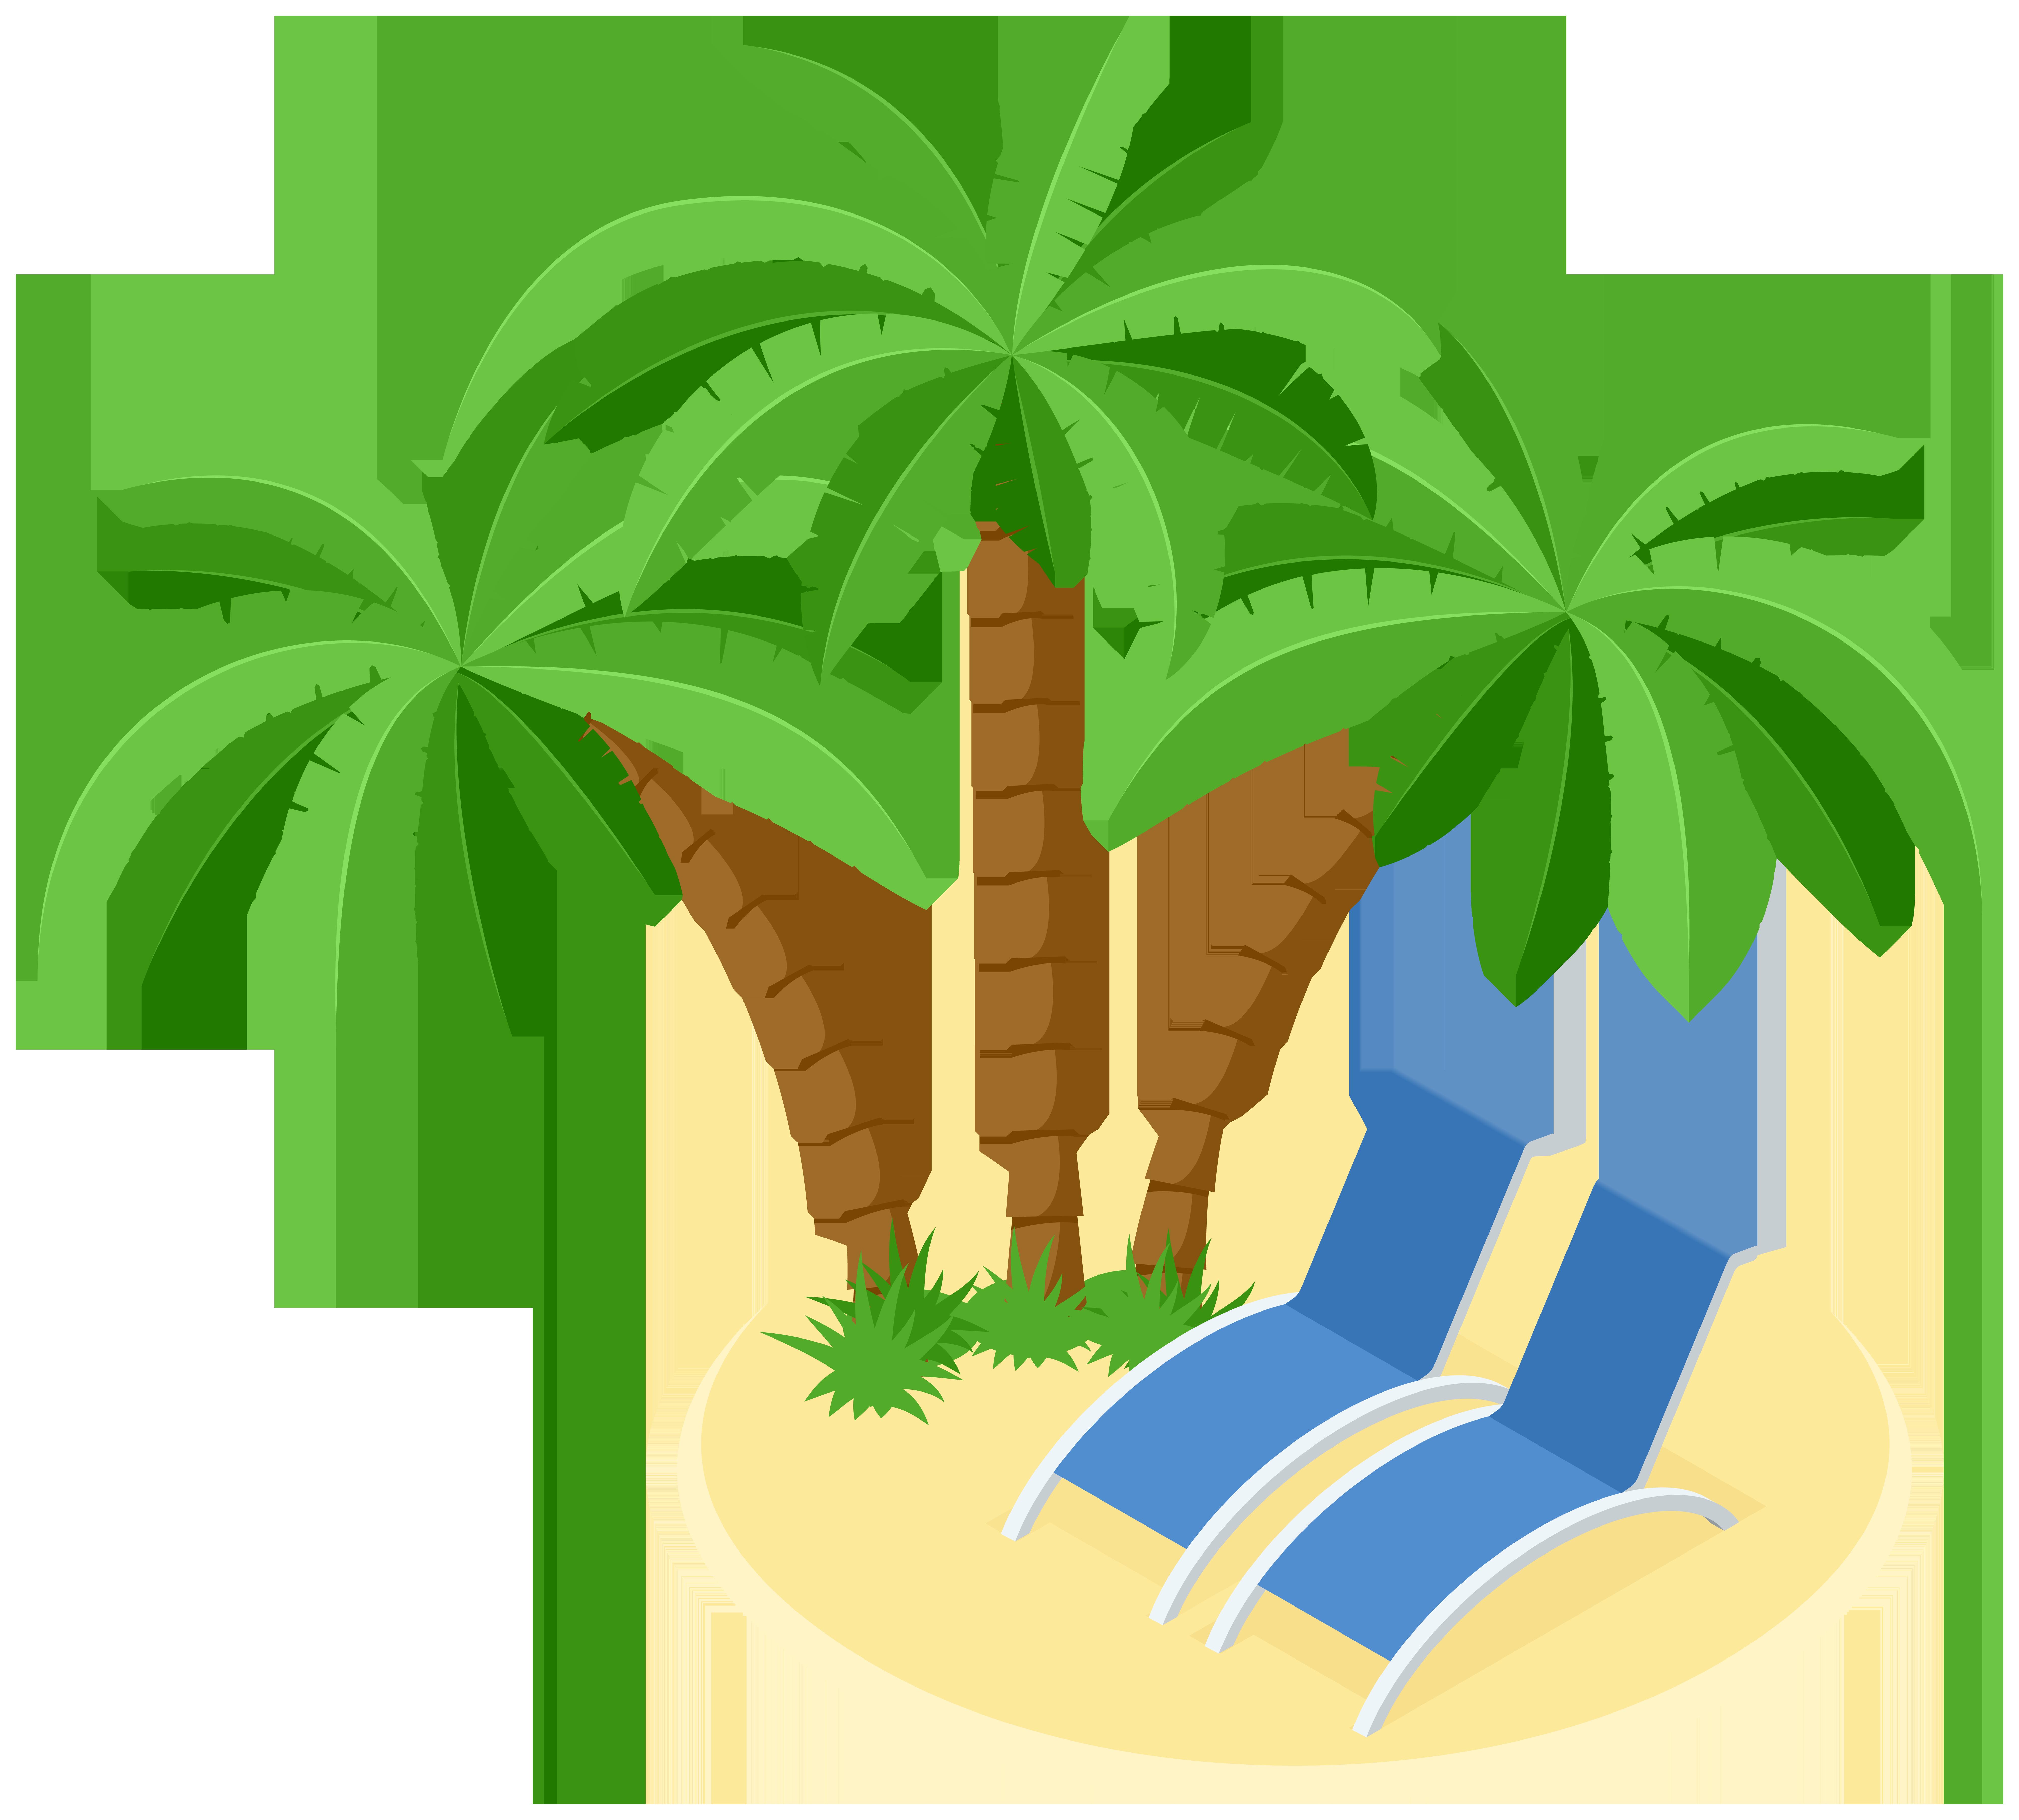 Beach island clipart vector Beach Island Transparent Image | Gallery Yopriceville - High ... vector